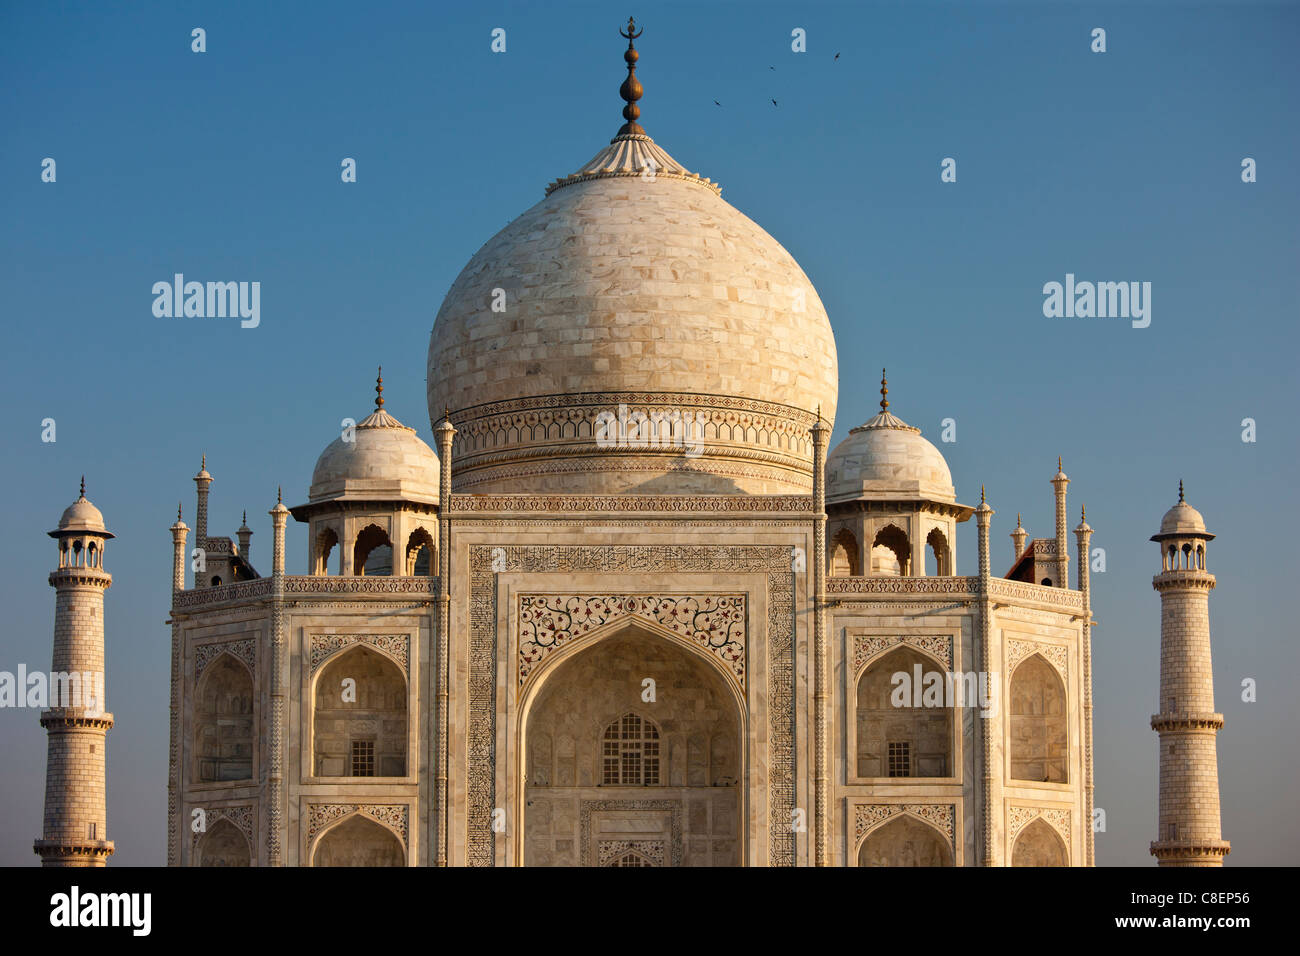 Il Taj Mahal mausoleo southern visualizza dettagli, Uttar Pradesh, India Immagini Stock